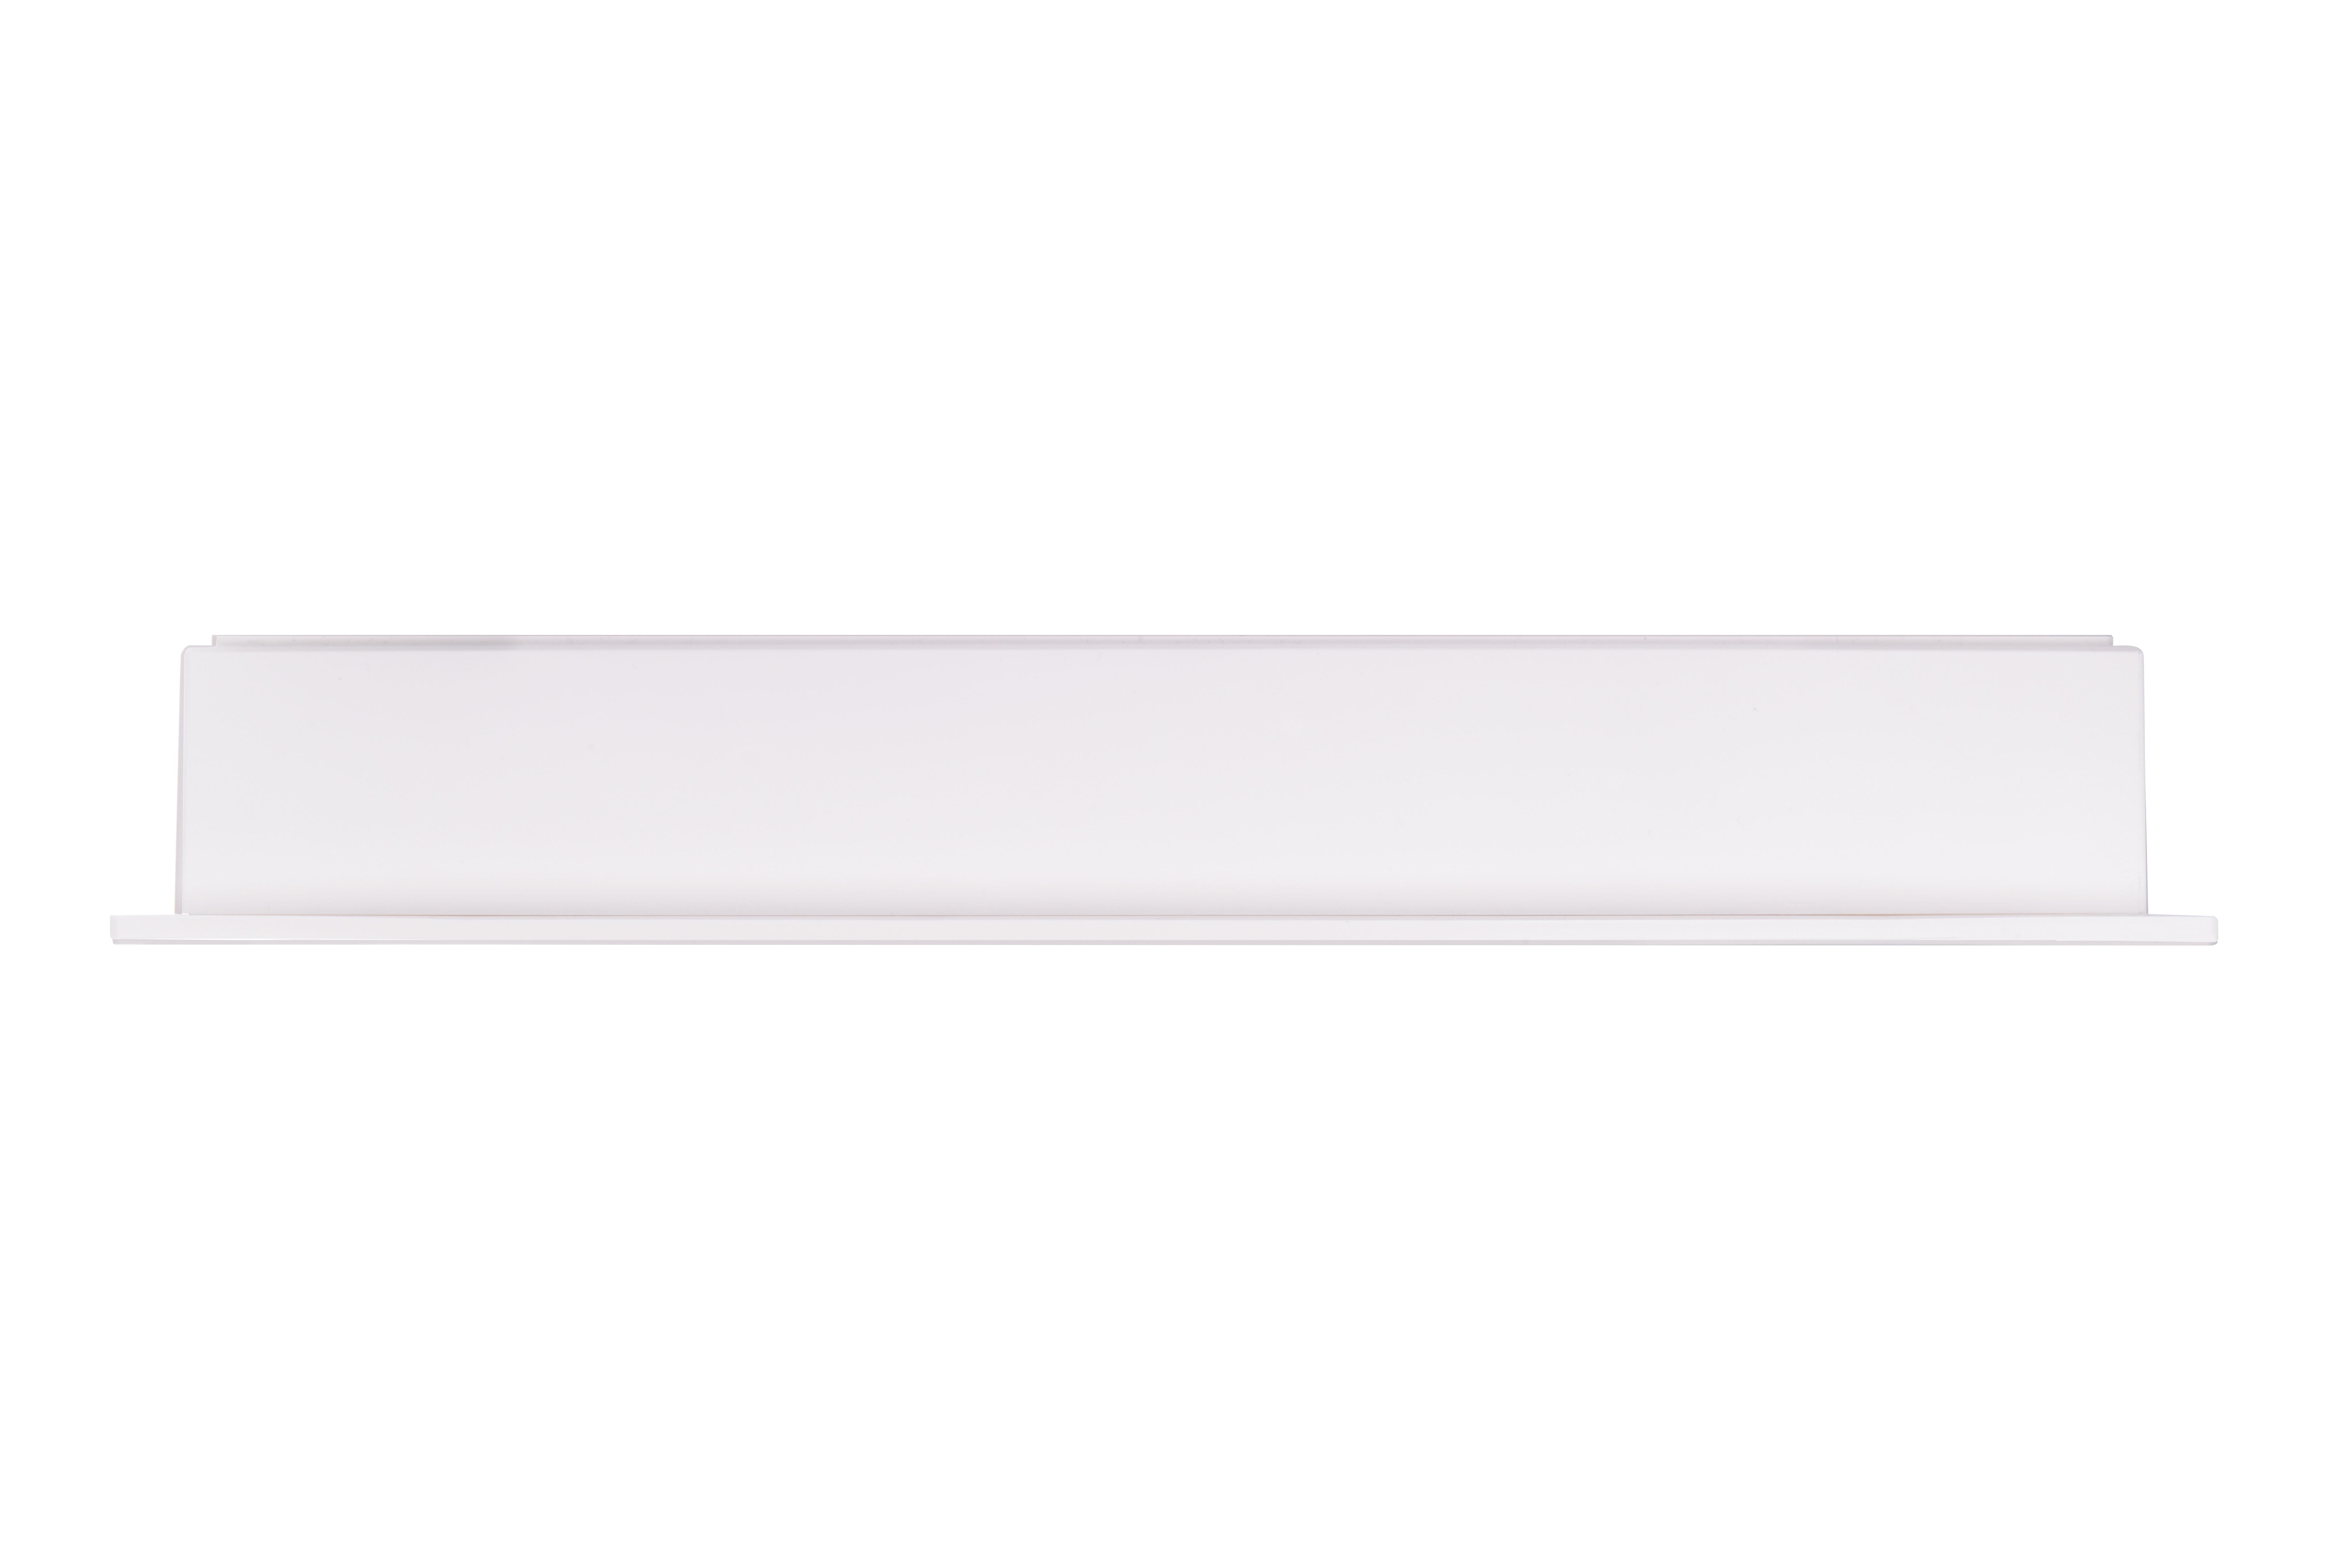 Lampa emergenta led Intelight 94517   3h mentinut test automat5